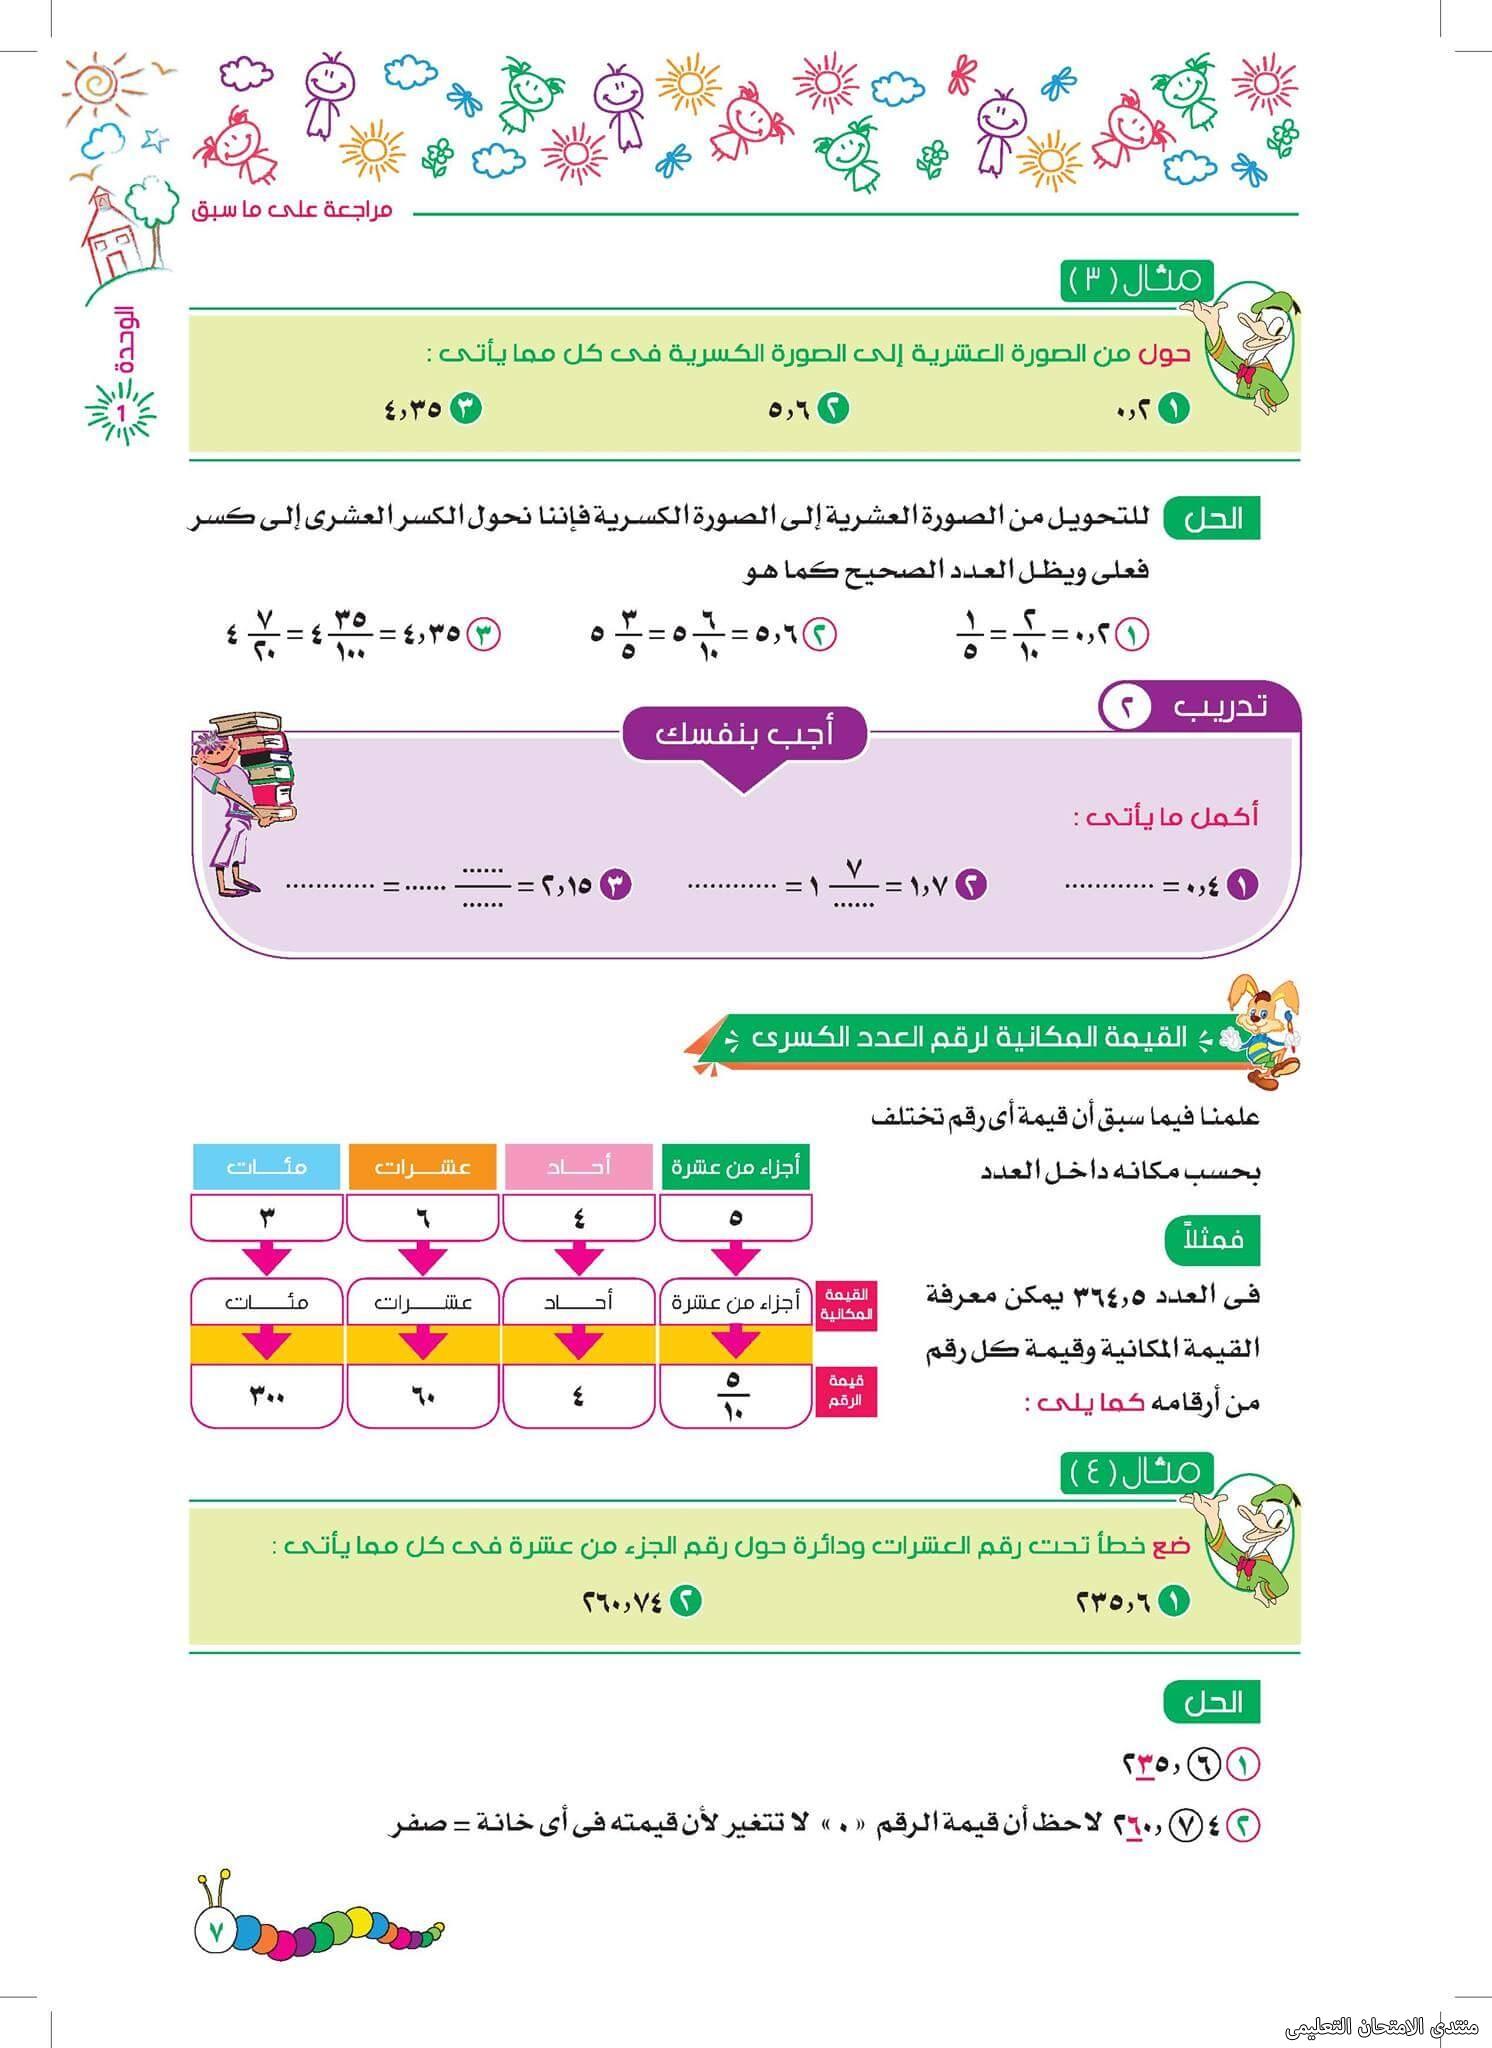 exam-eg.com_163155365485842.jpg